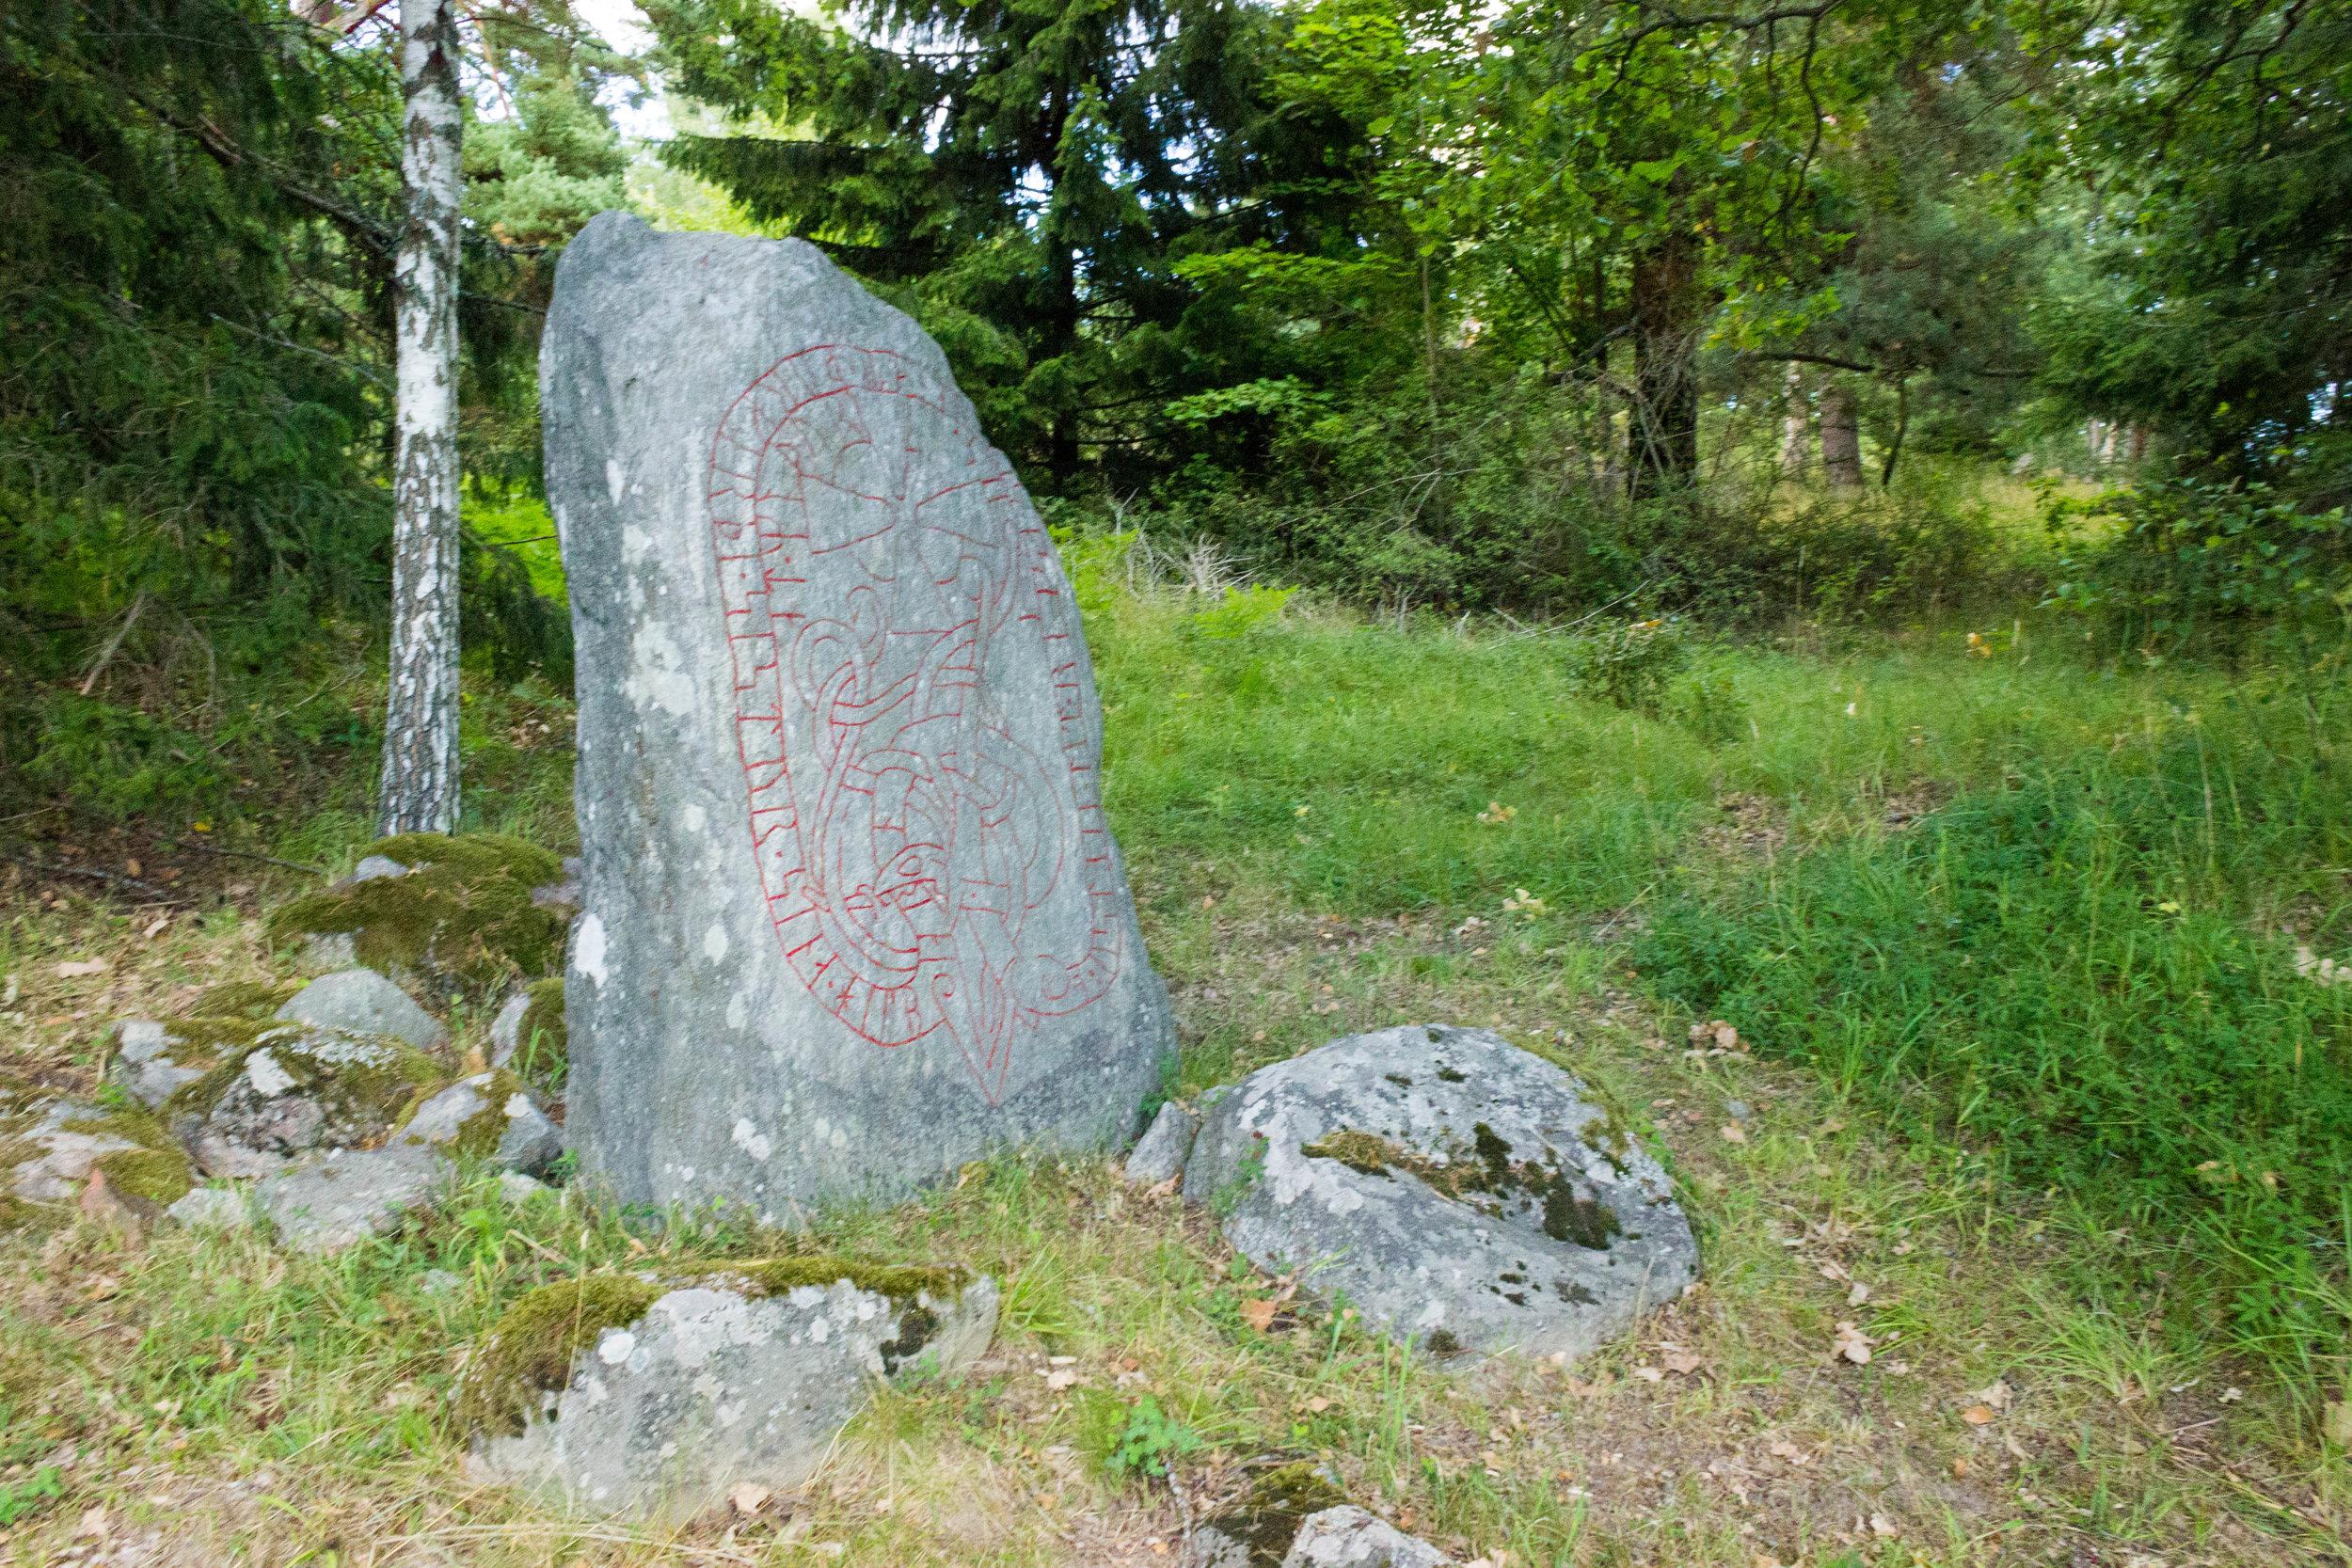 A viking rune stone